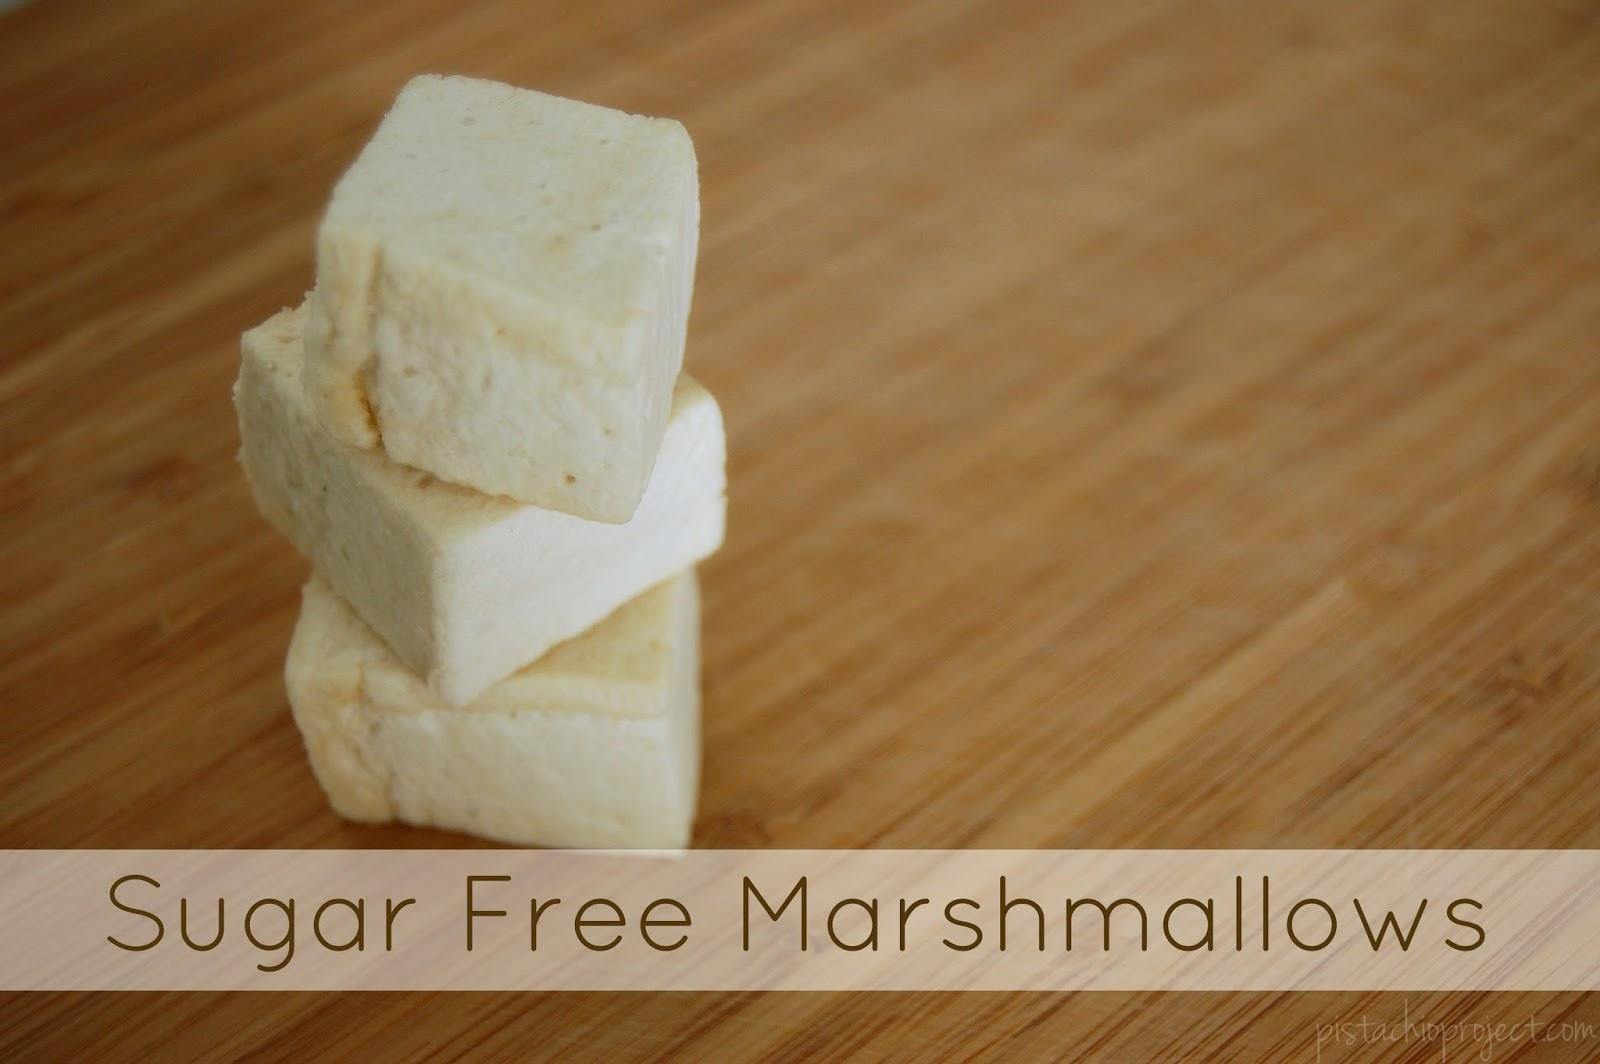 Homemade Sugar Free Marshmallows